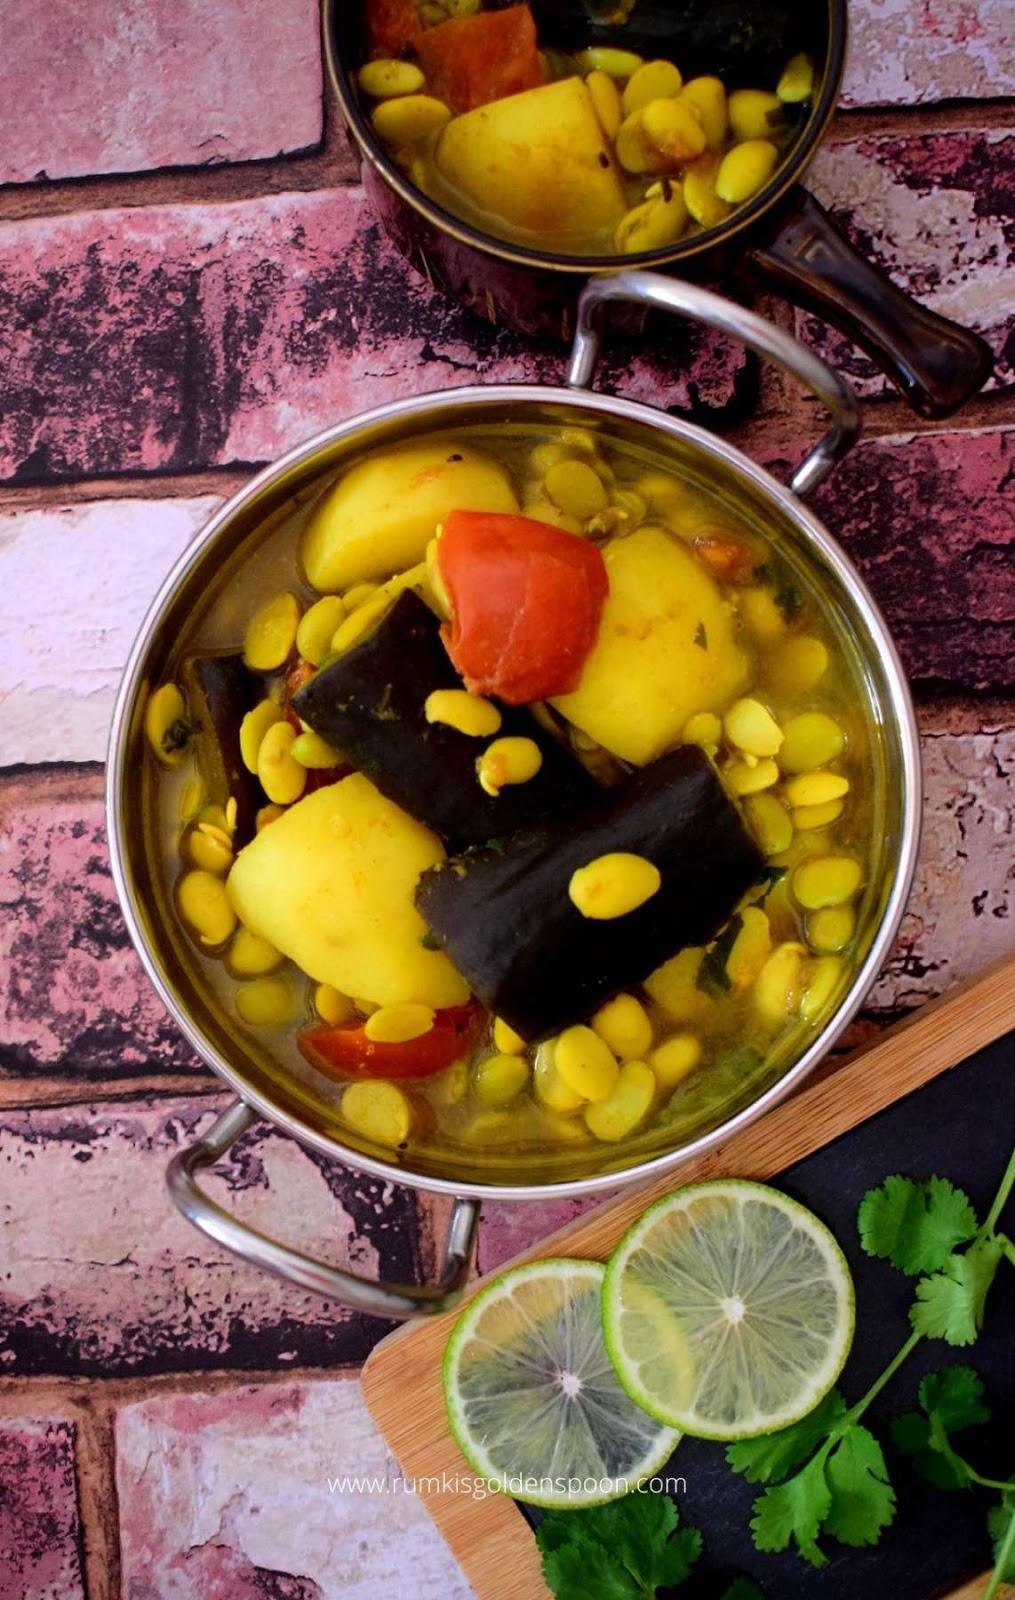 Shimer Bichir Dal, Shimmer Bichir Dal, Sheemer Bichir Dal, shimer bichi recipe, Shimer Bichir recipe, shimer bisir dal, frozen broad beans recipe, frozen broad beans curry, broad beans curry, broad beans curry recipe, broad beans seeds curry, Broad Beans recipe Indian, Broad Beans recipe, Broad Beans recipes, broad beans recipe vegetarian, lima beans recipe, lima beans recipe Indian, raw lima beans recipe, lima beans curry, lima beans curry recipe, lima beans curry Indian style, n onion no garlic recipe, fava beans curry, fava beans recipe, fava beans recipe Indian, bengali recipe, bengali recipes, bengali food, Rumki's Golden Spoon